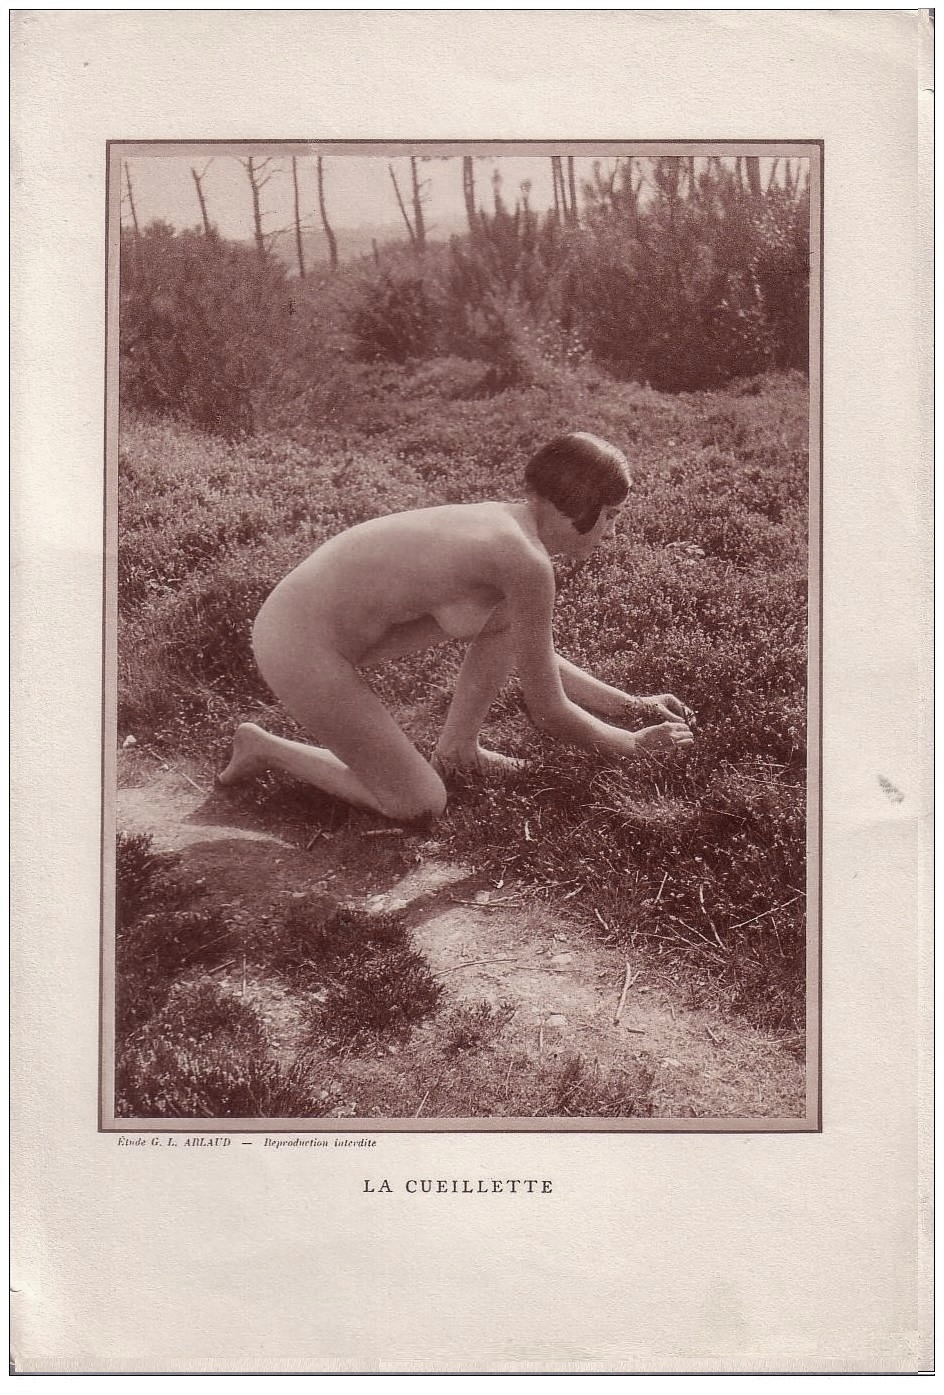 Etude G. L Arlaud - La Cueillette, 1930